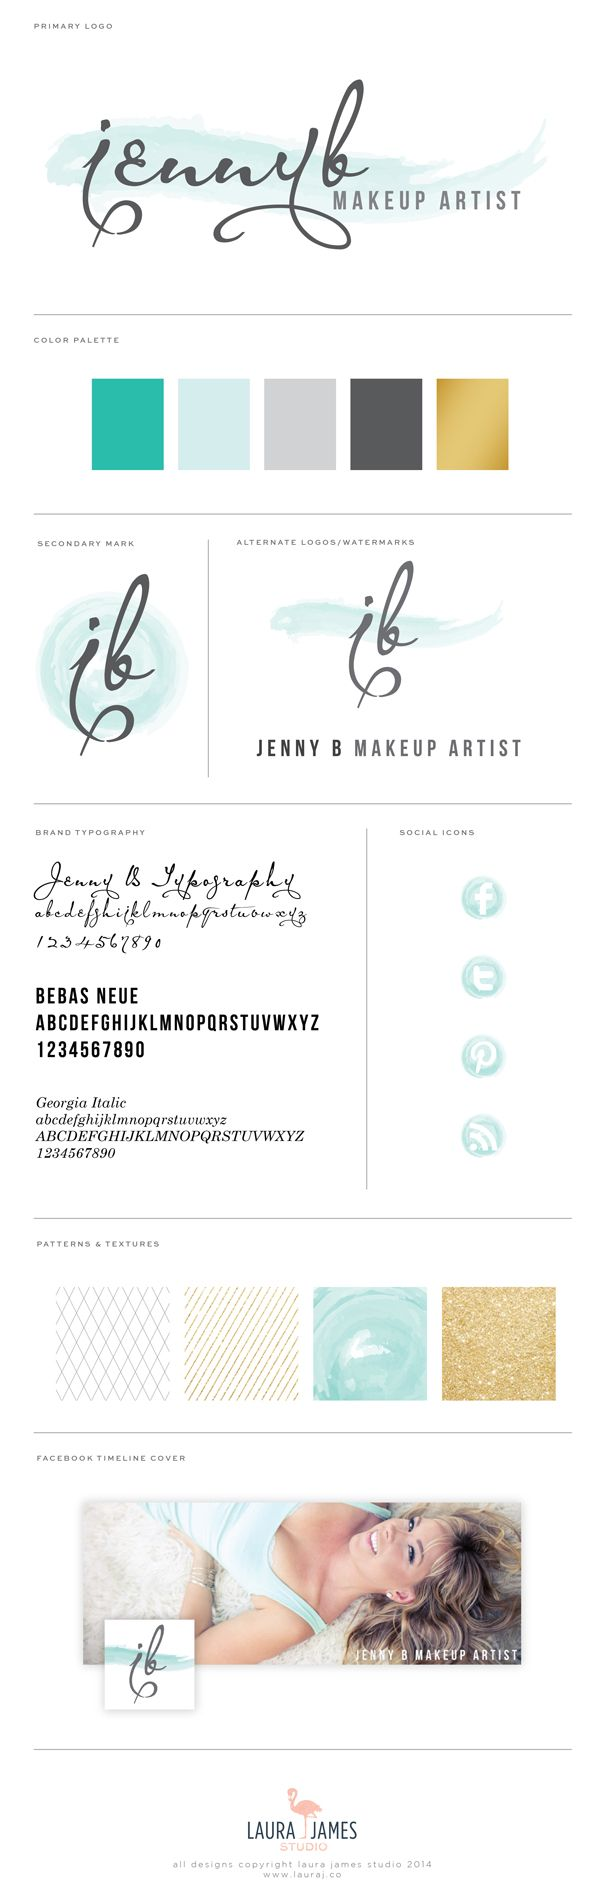 watercolor aqua teal gold black grey logo brand identity visual guide great photography logo idea